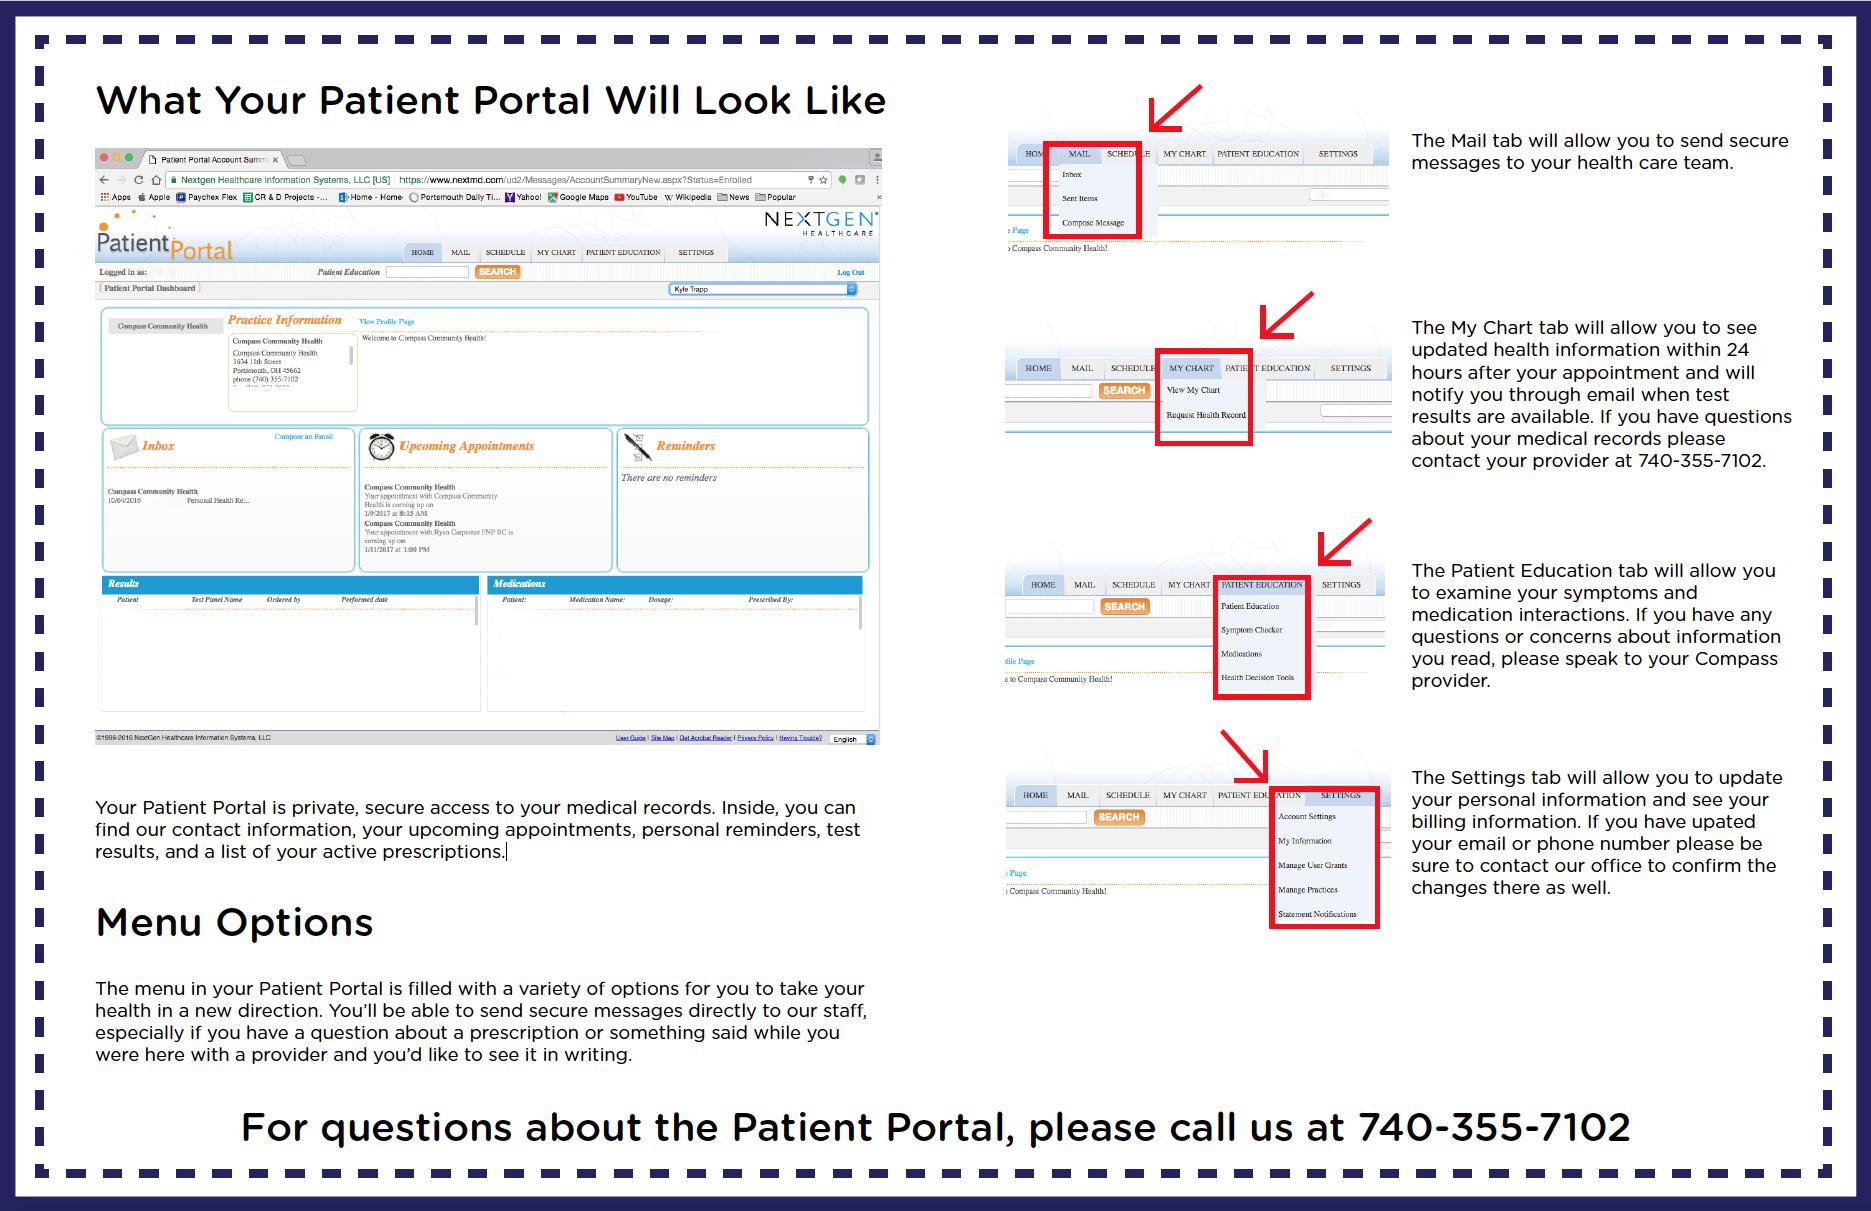 Patient Portal Walkthrough Side 1